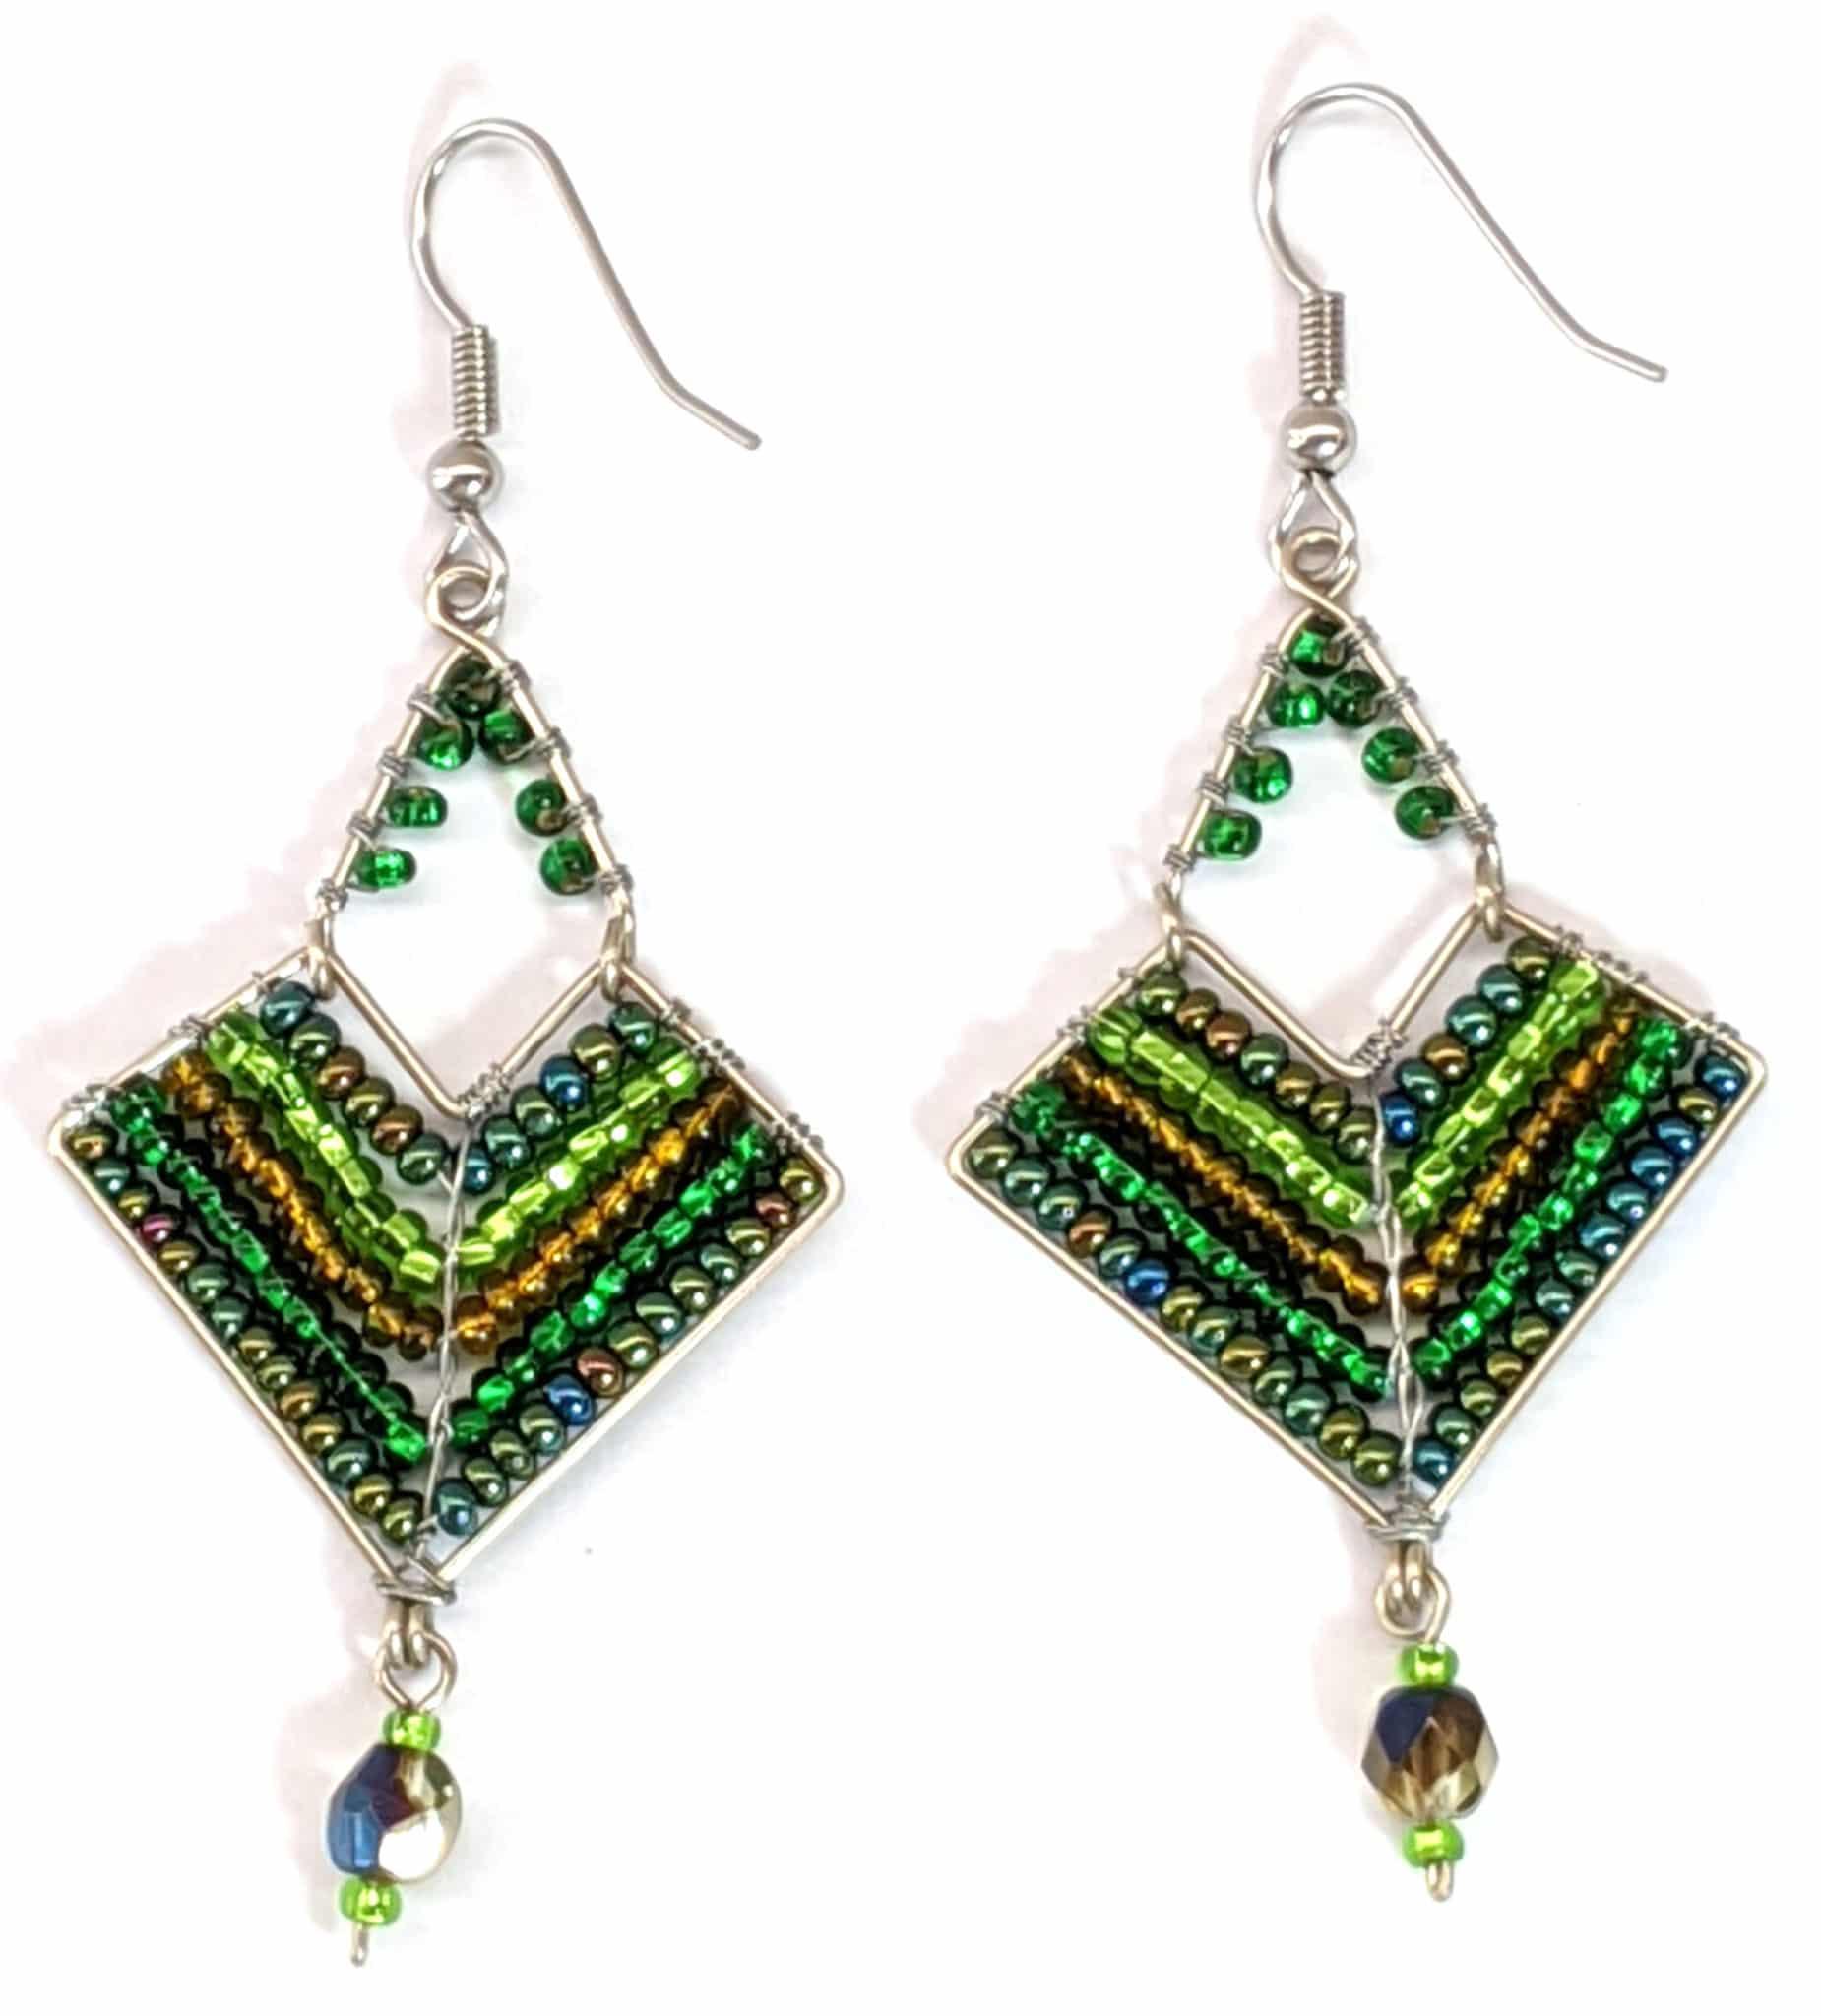 Chevron Earrings - Greens